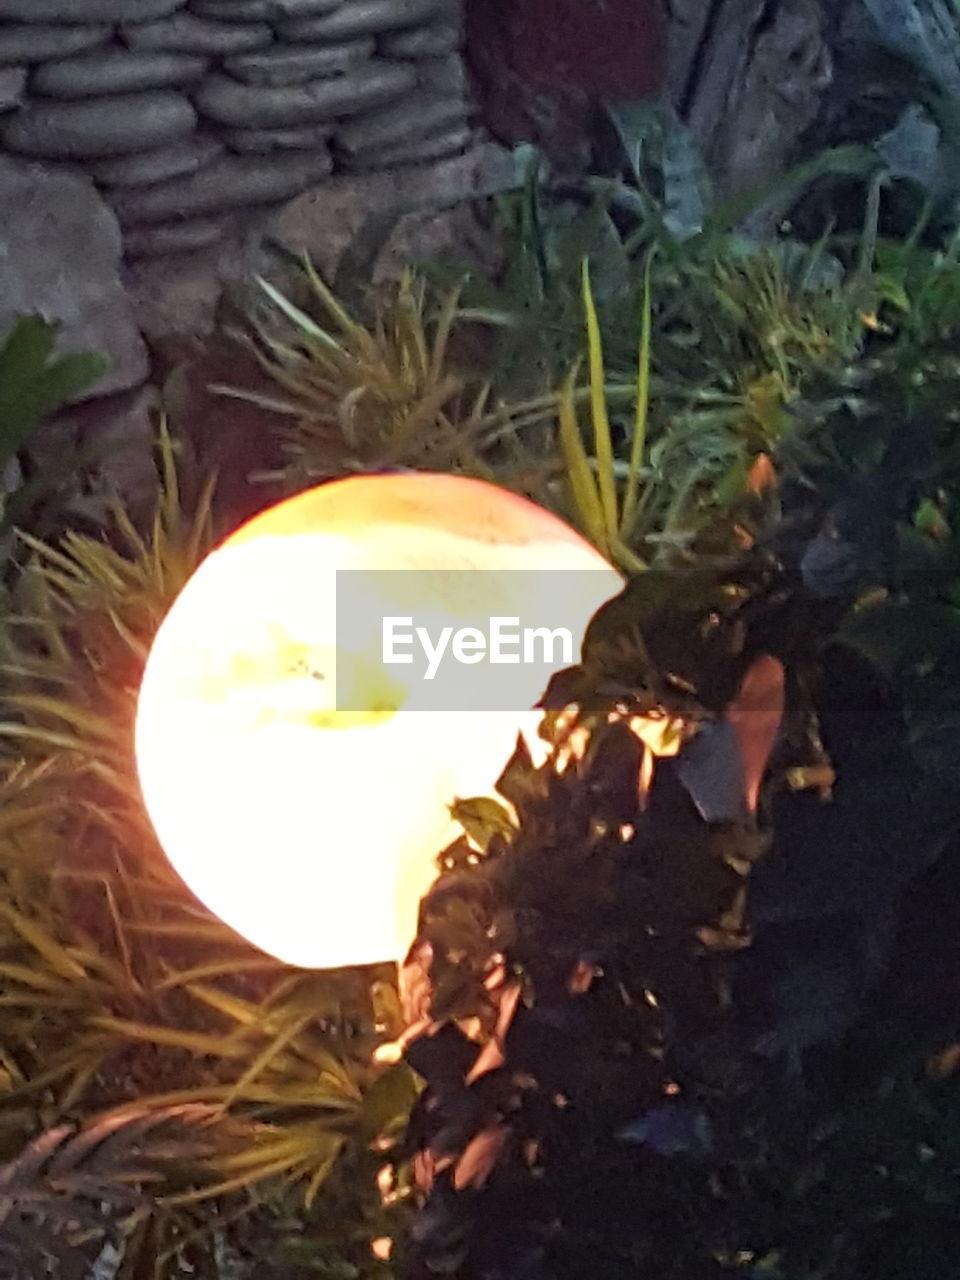 illuminated, no people, flame, close-up, burning, night, outdoors, leaf, light bulb